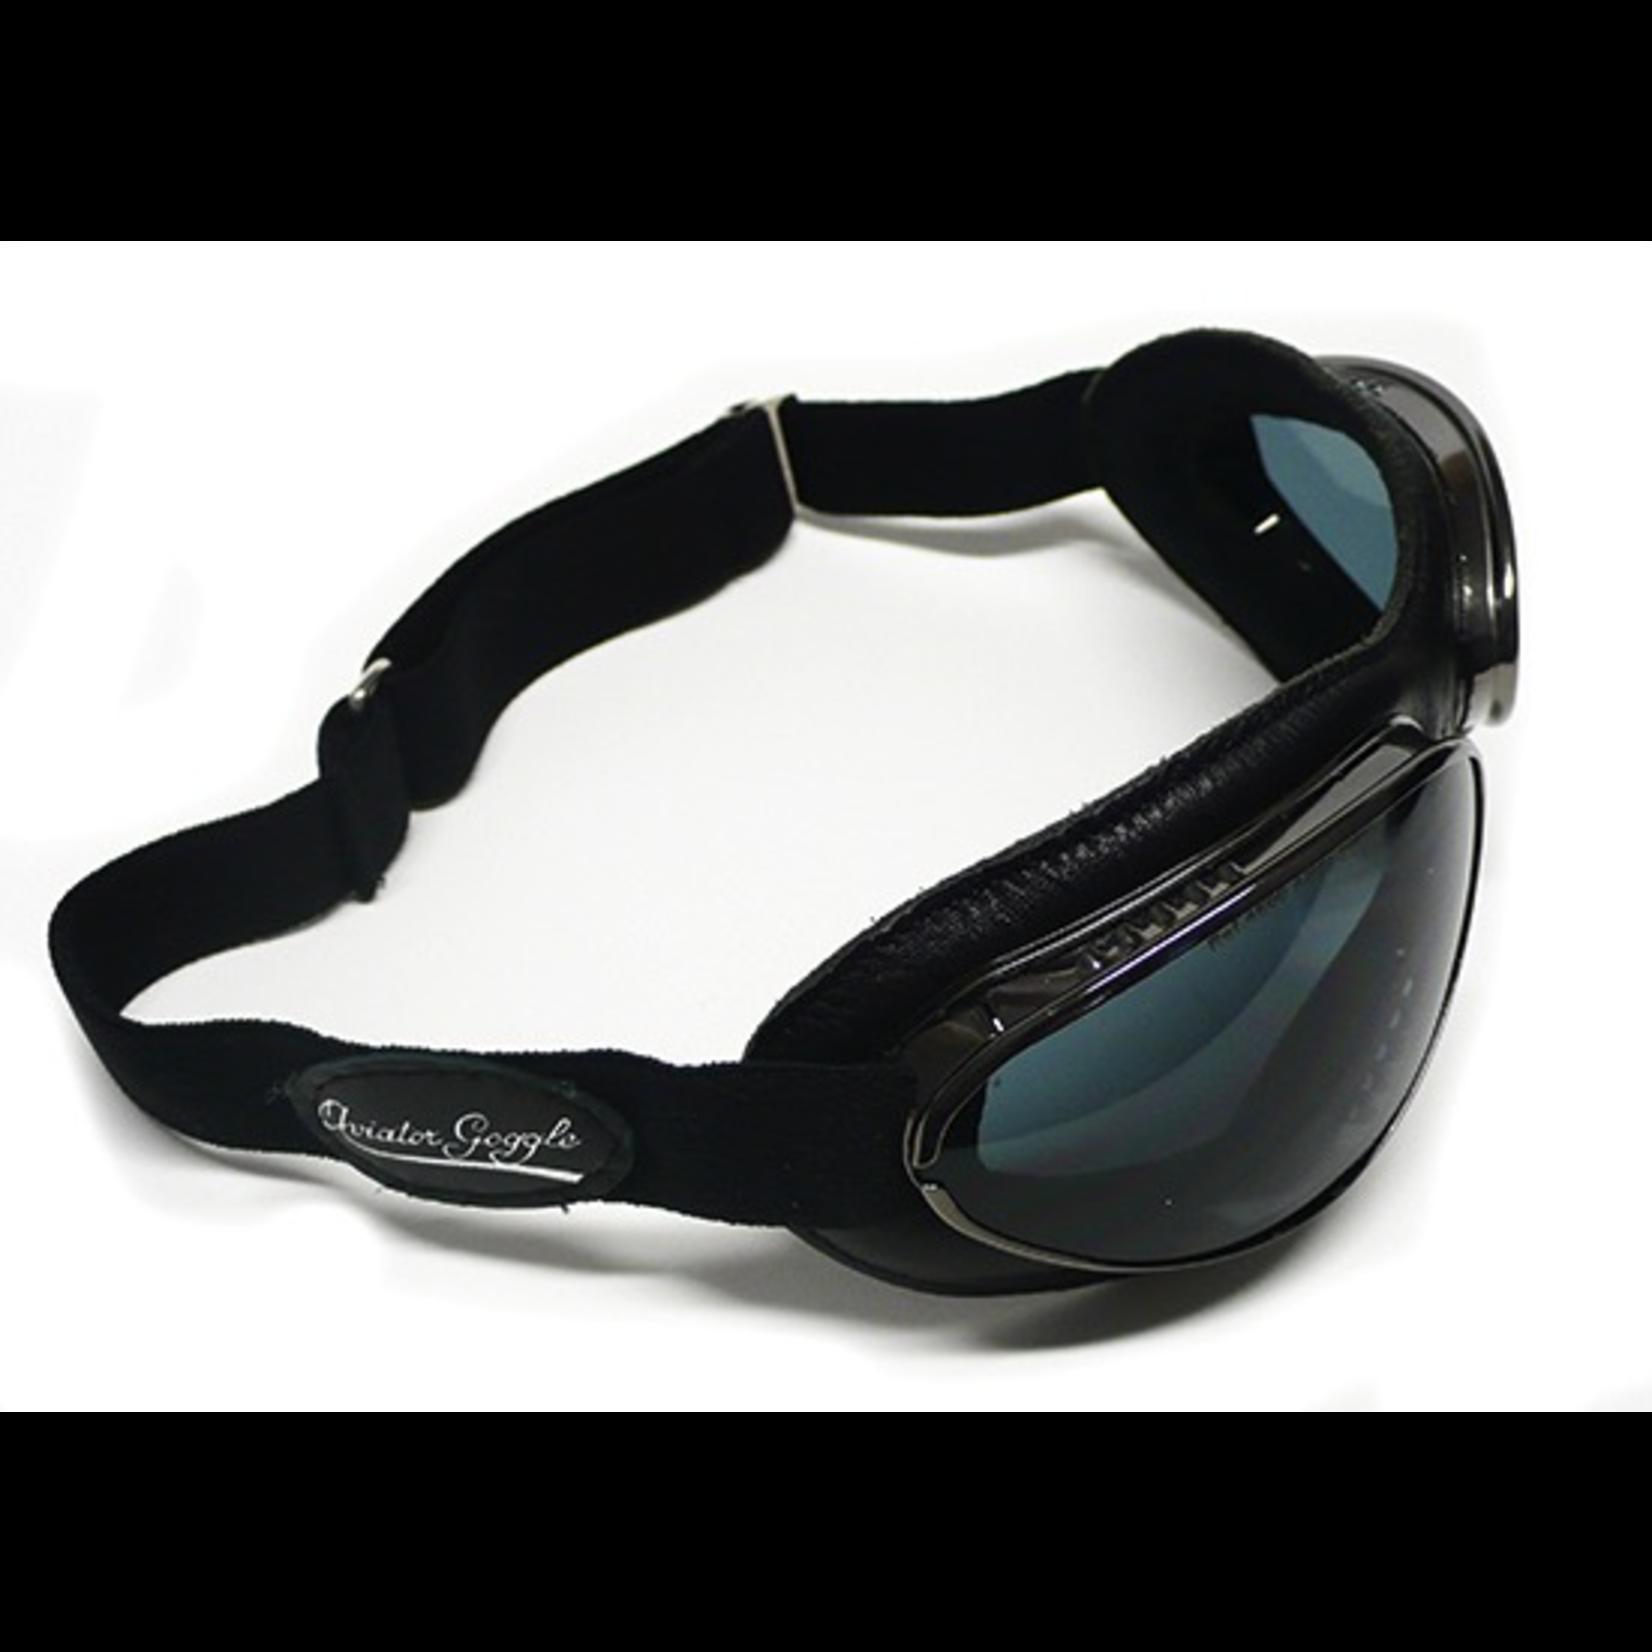 Apparel Goggles, Aviator Chrome Black Leather (France)